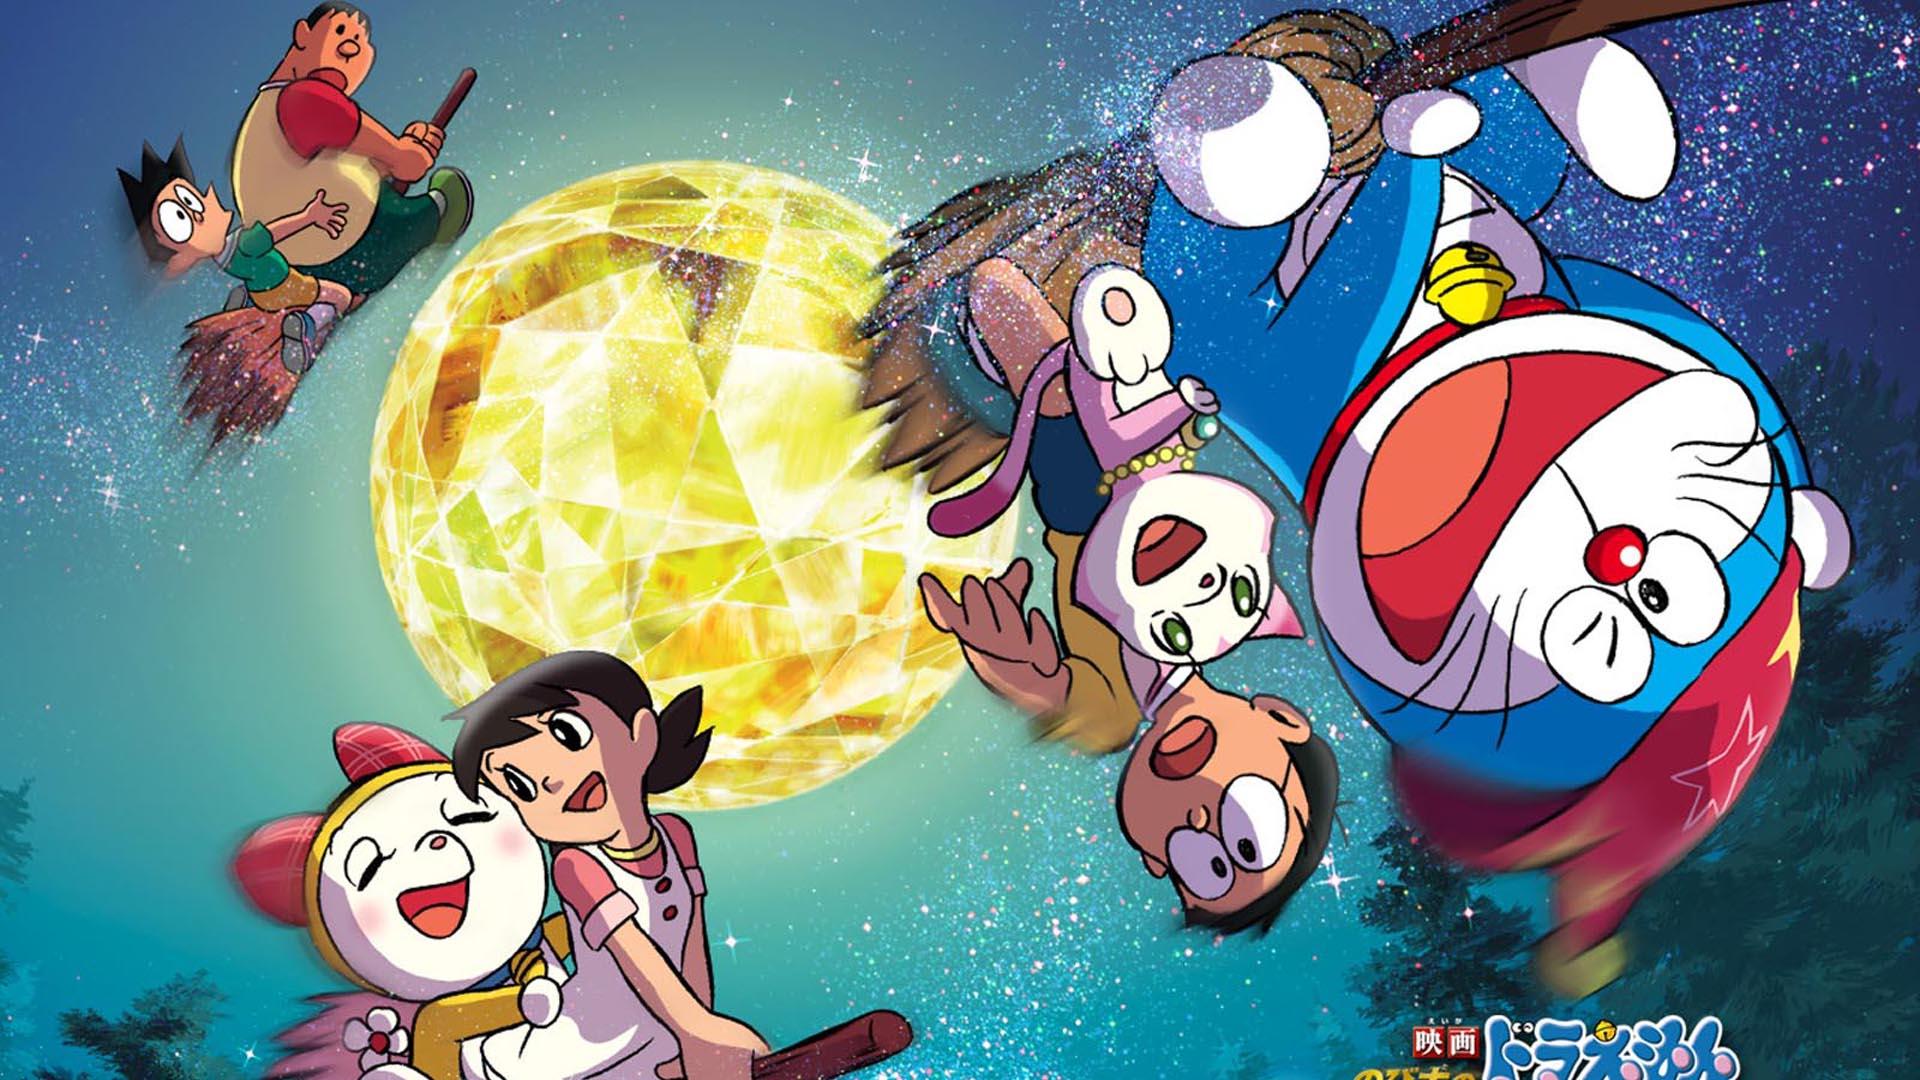 Doraemon Wallpaper 8 Wallpapersbq